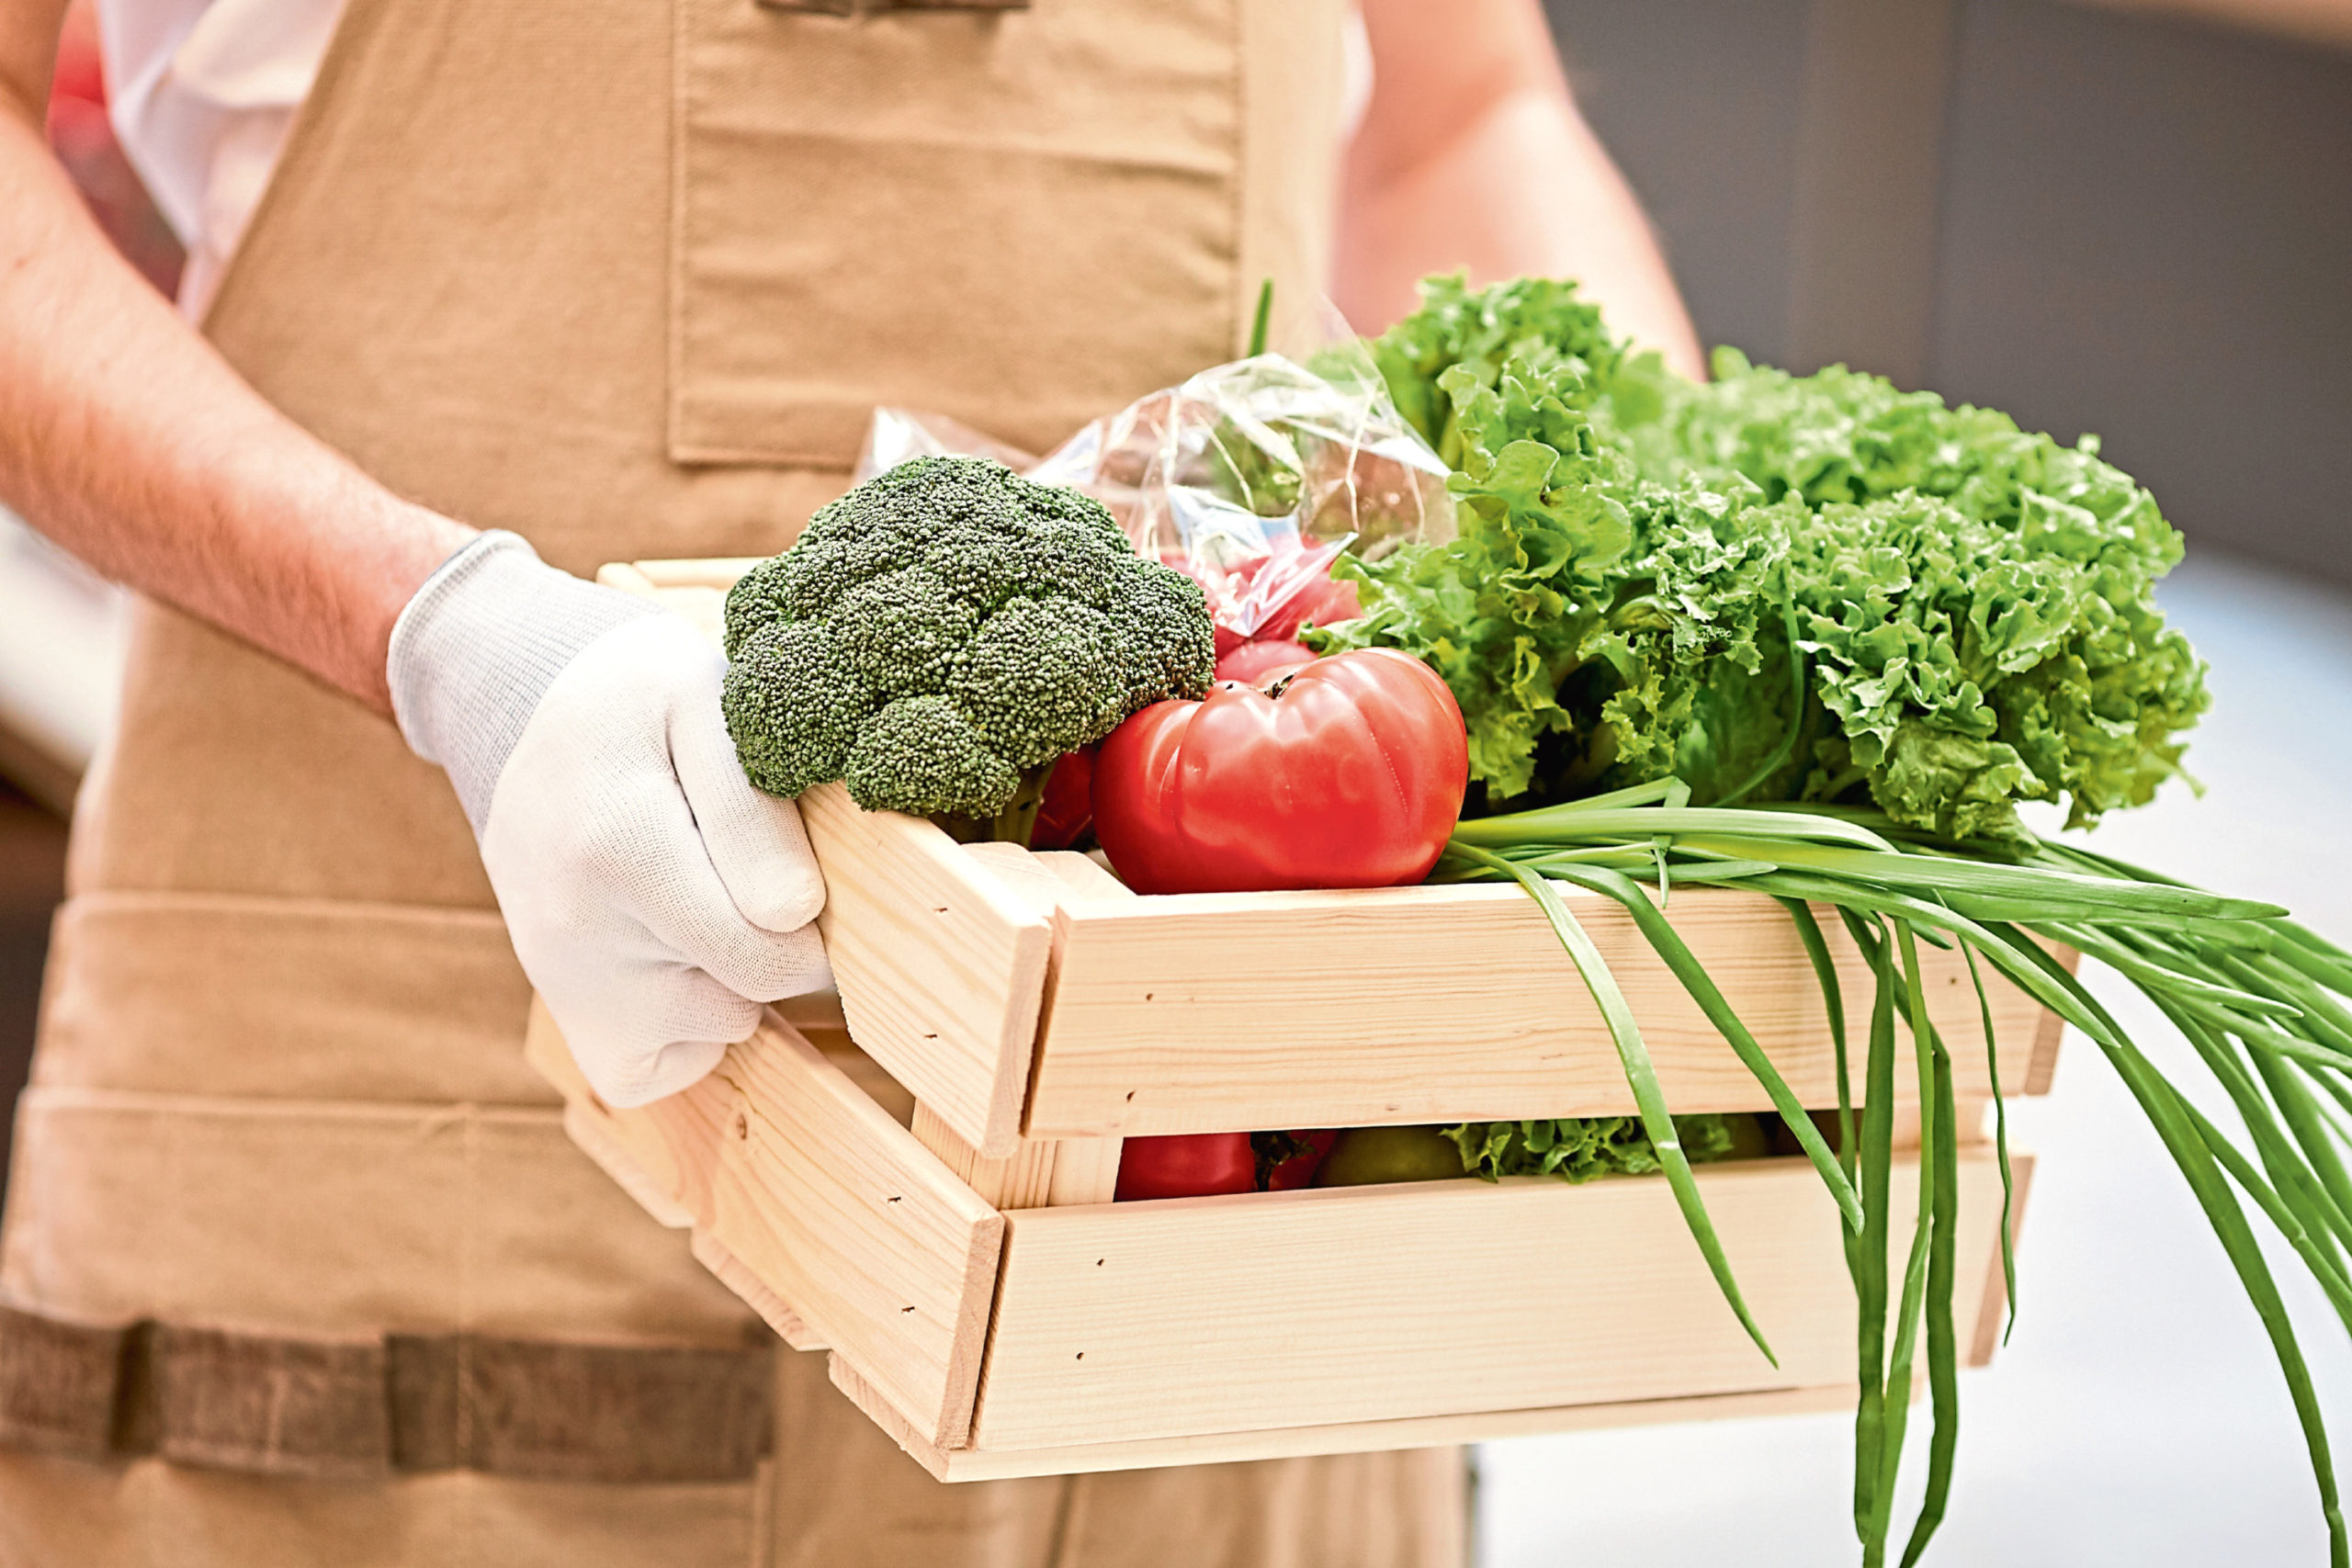 Sales of vegetable boxes have soared under lockdown.